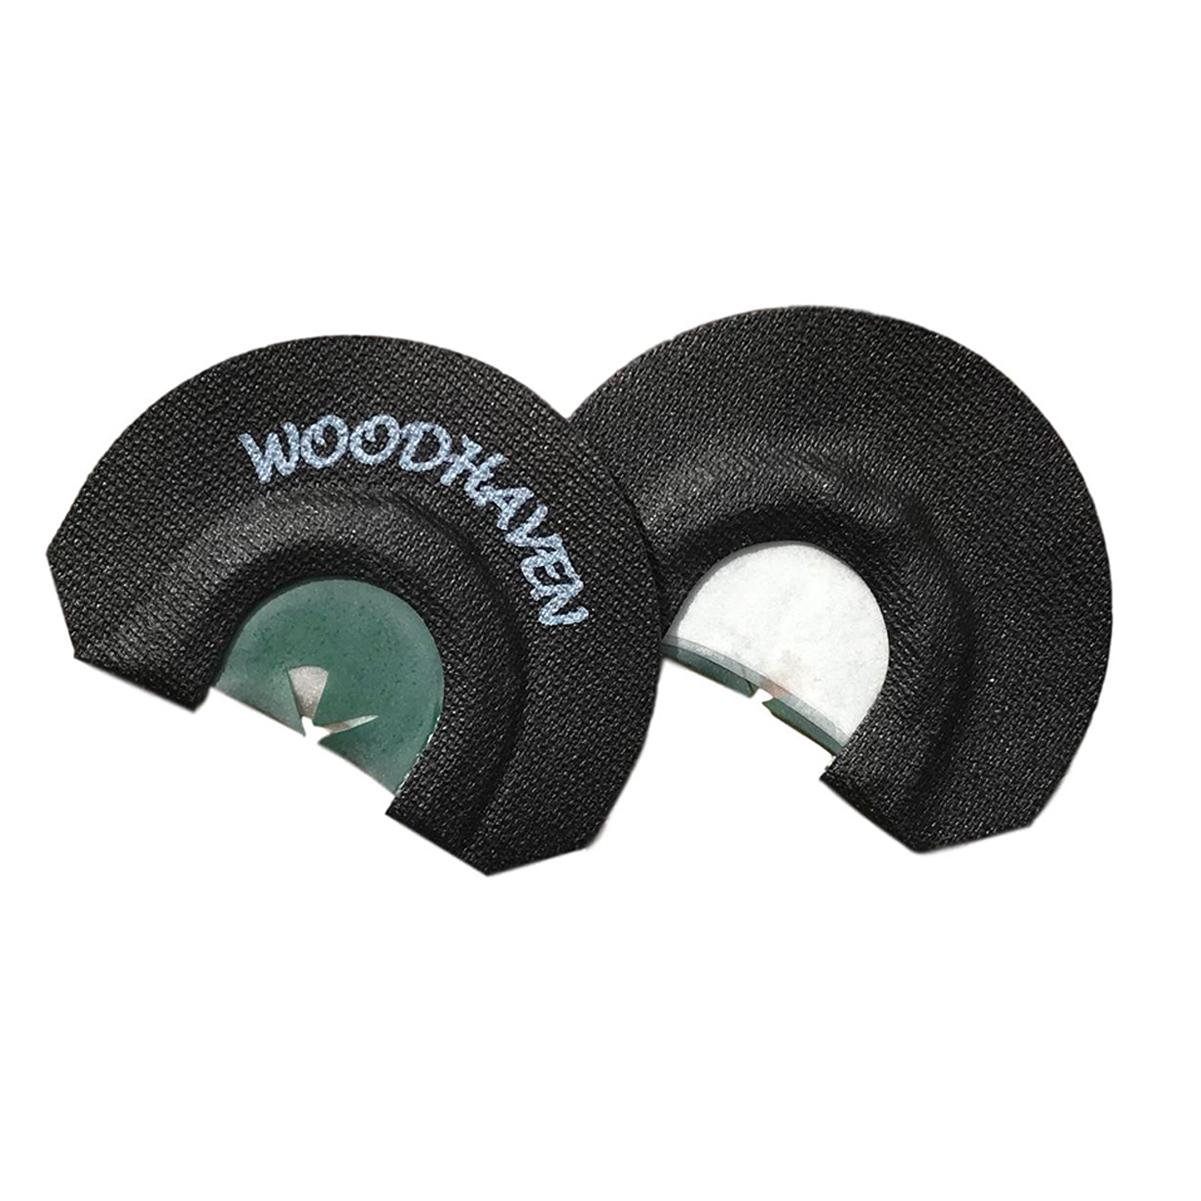 WoodHaven Hyper Ninja Turkey Call